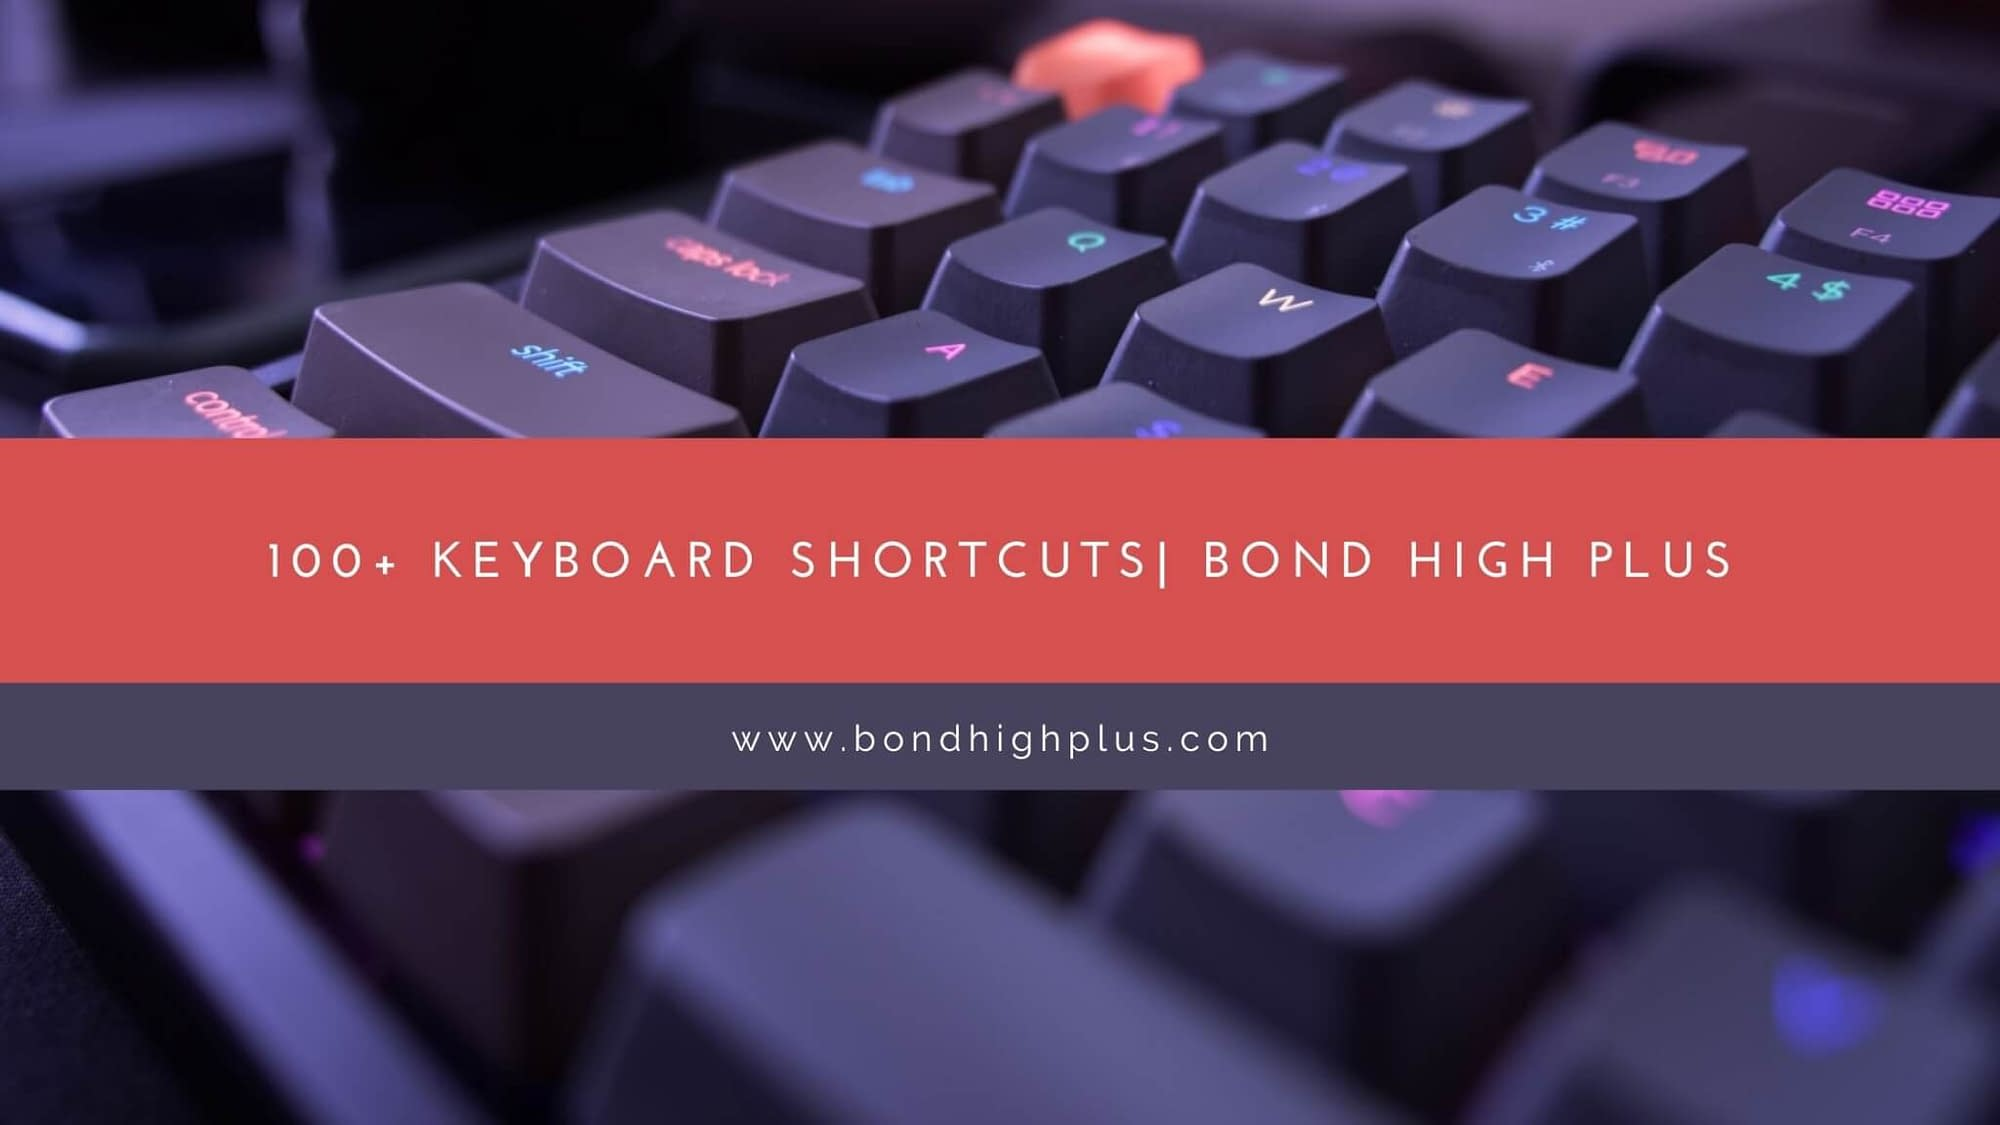 100+ Keyboard Shortcuts